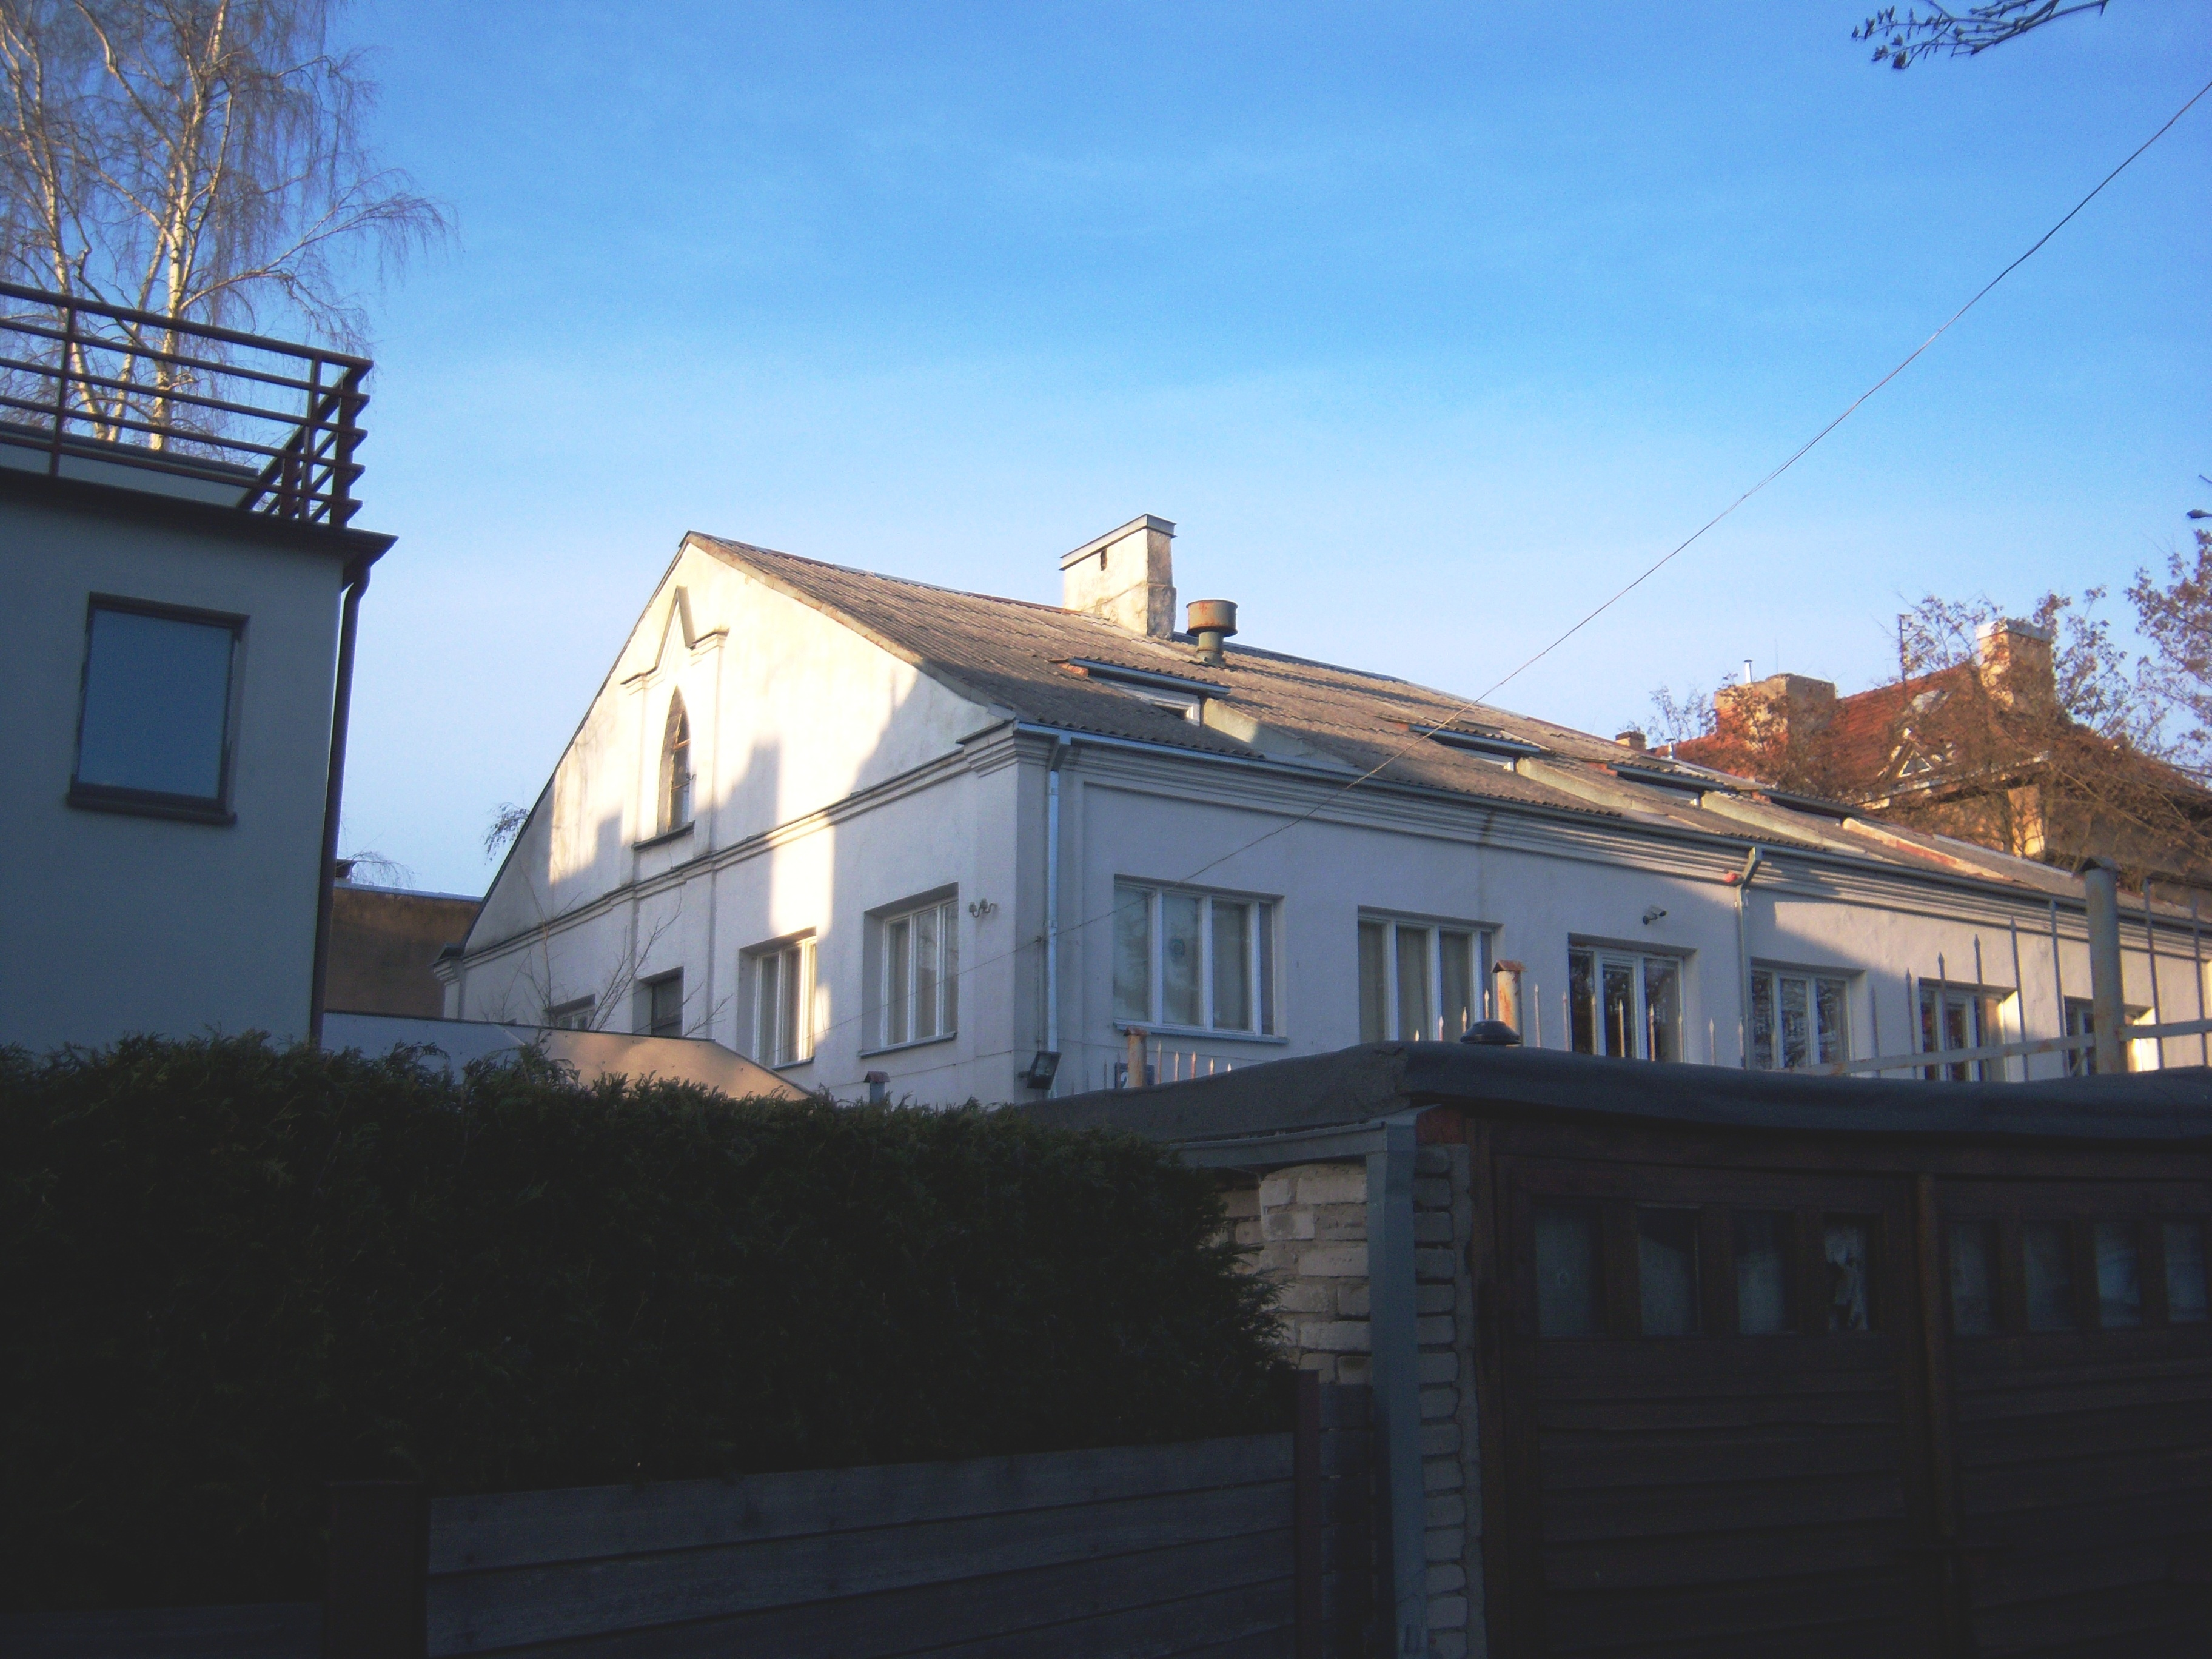 Kauno Gedimino g. sinagoga